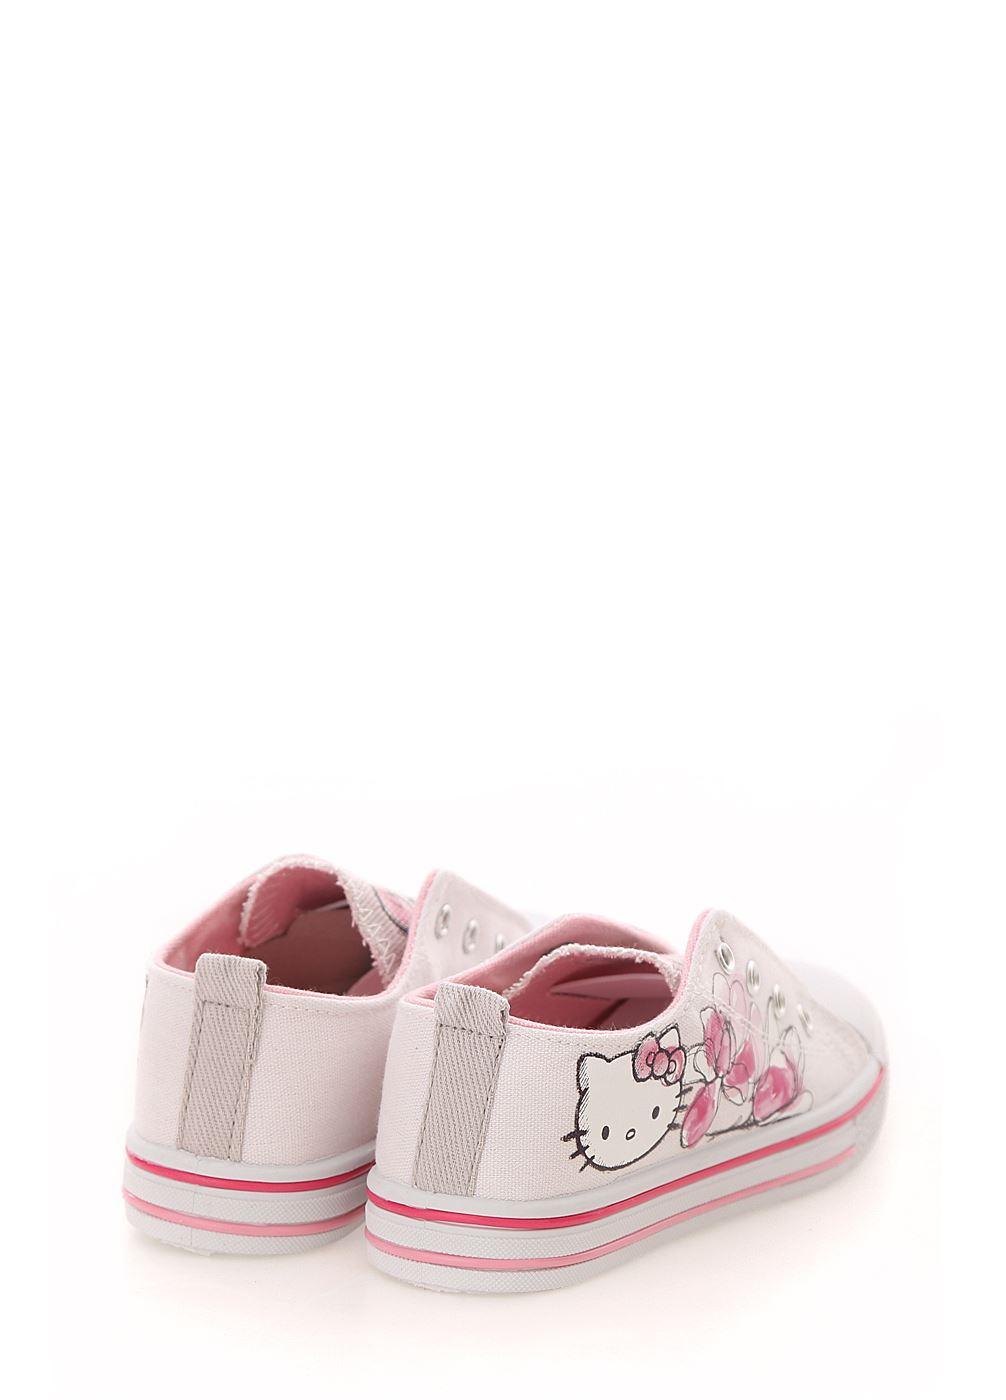 8b33fc1b03d Παιδικά Παπούτσια HELLO KITTY   brandsGalaxy